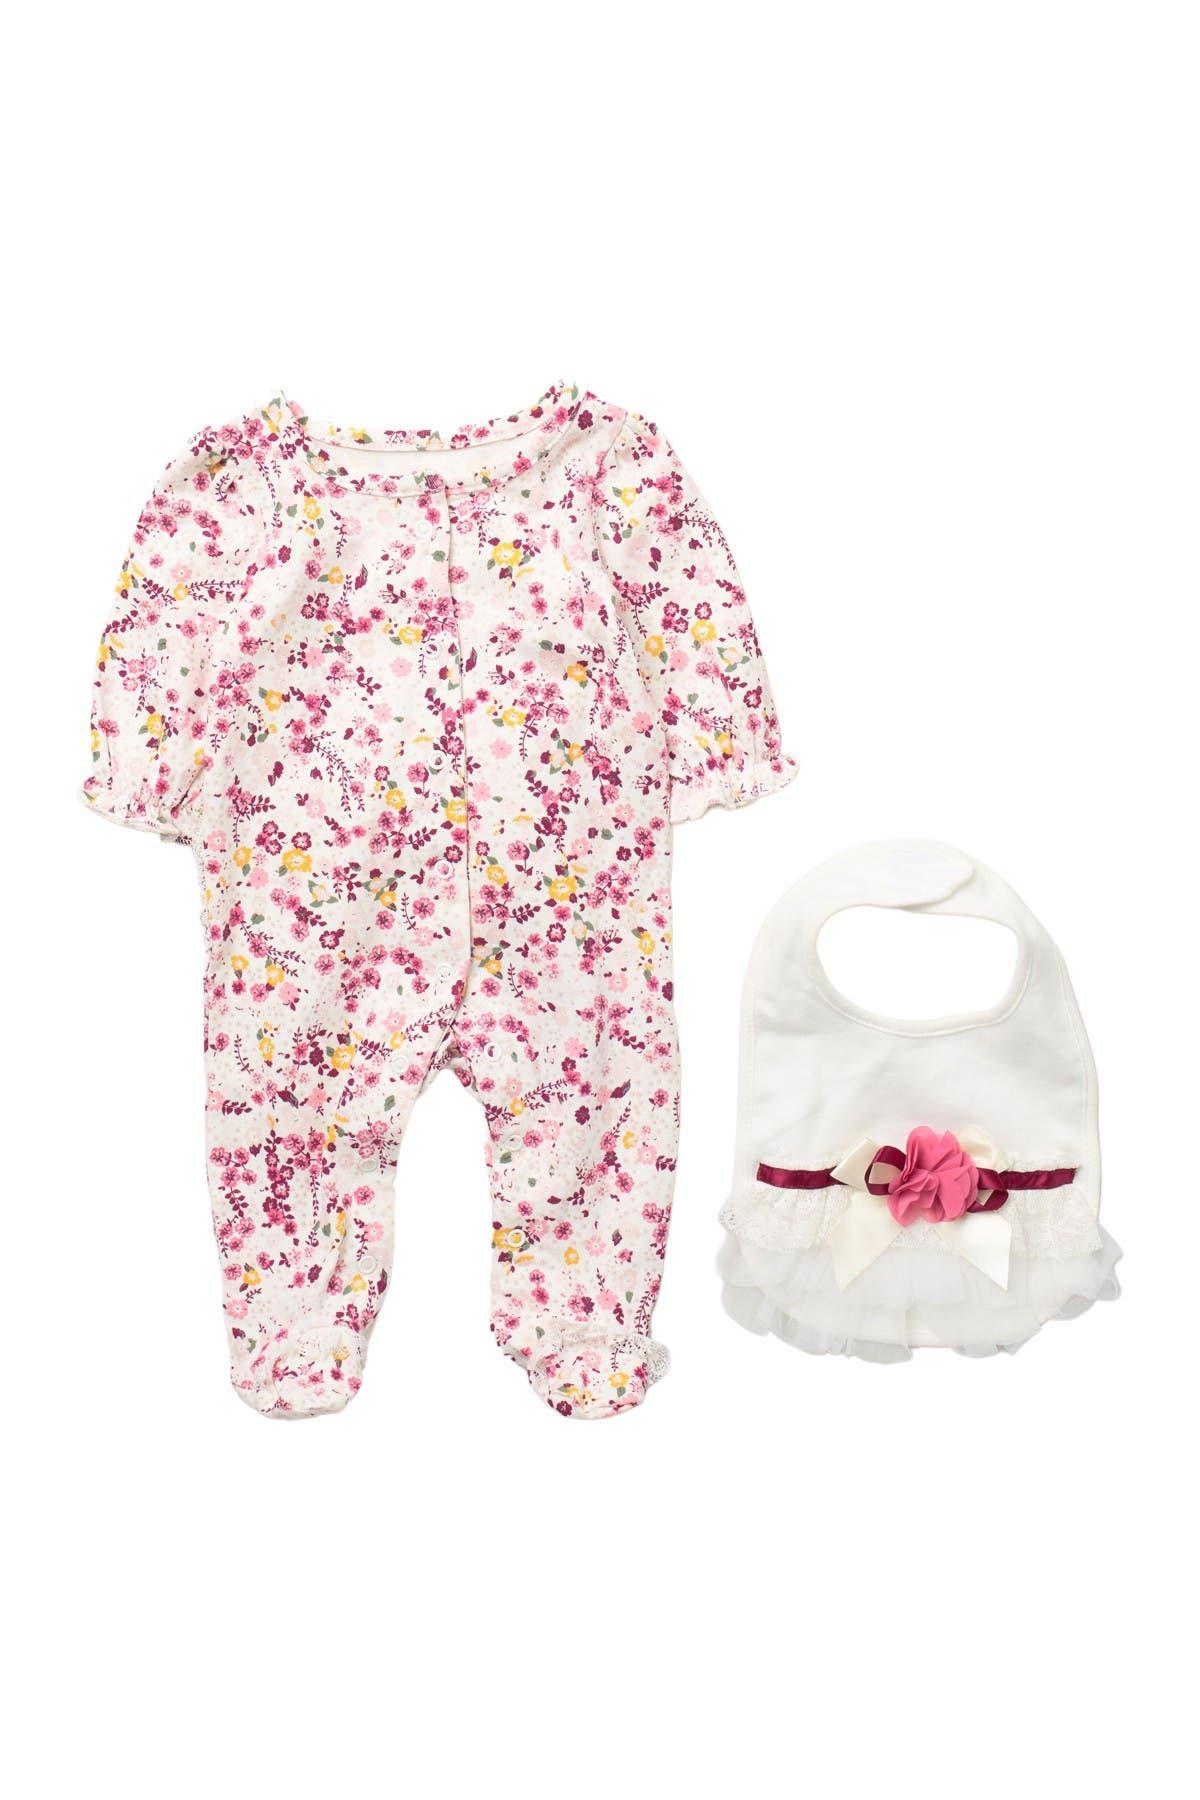 Image of Baby Starters Bodysuit and Bib 2-Piece Set